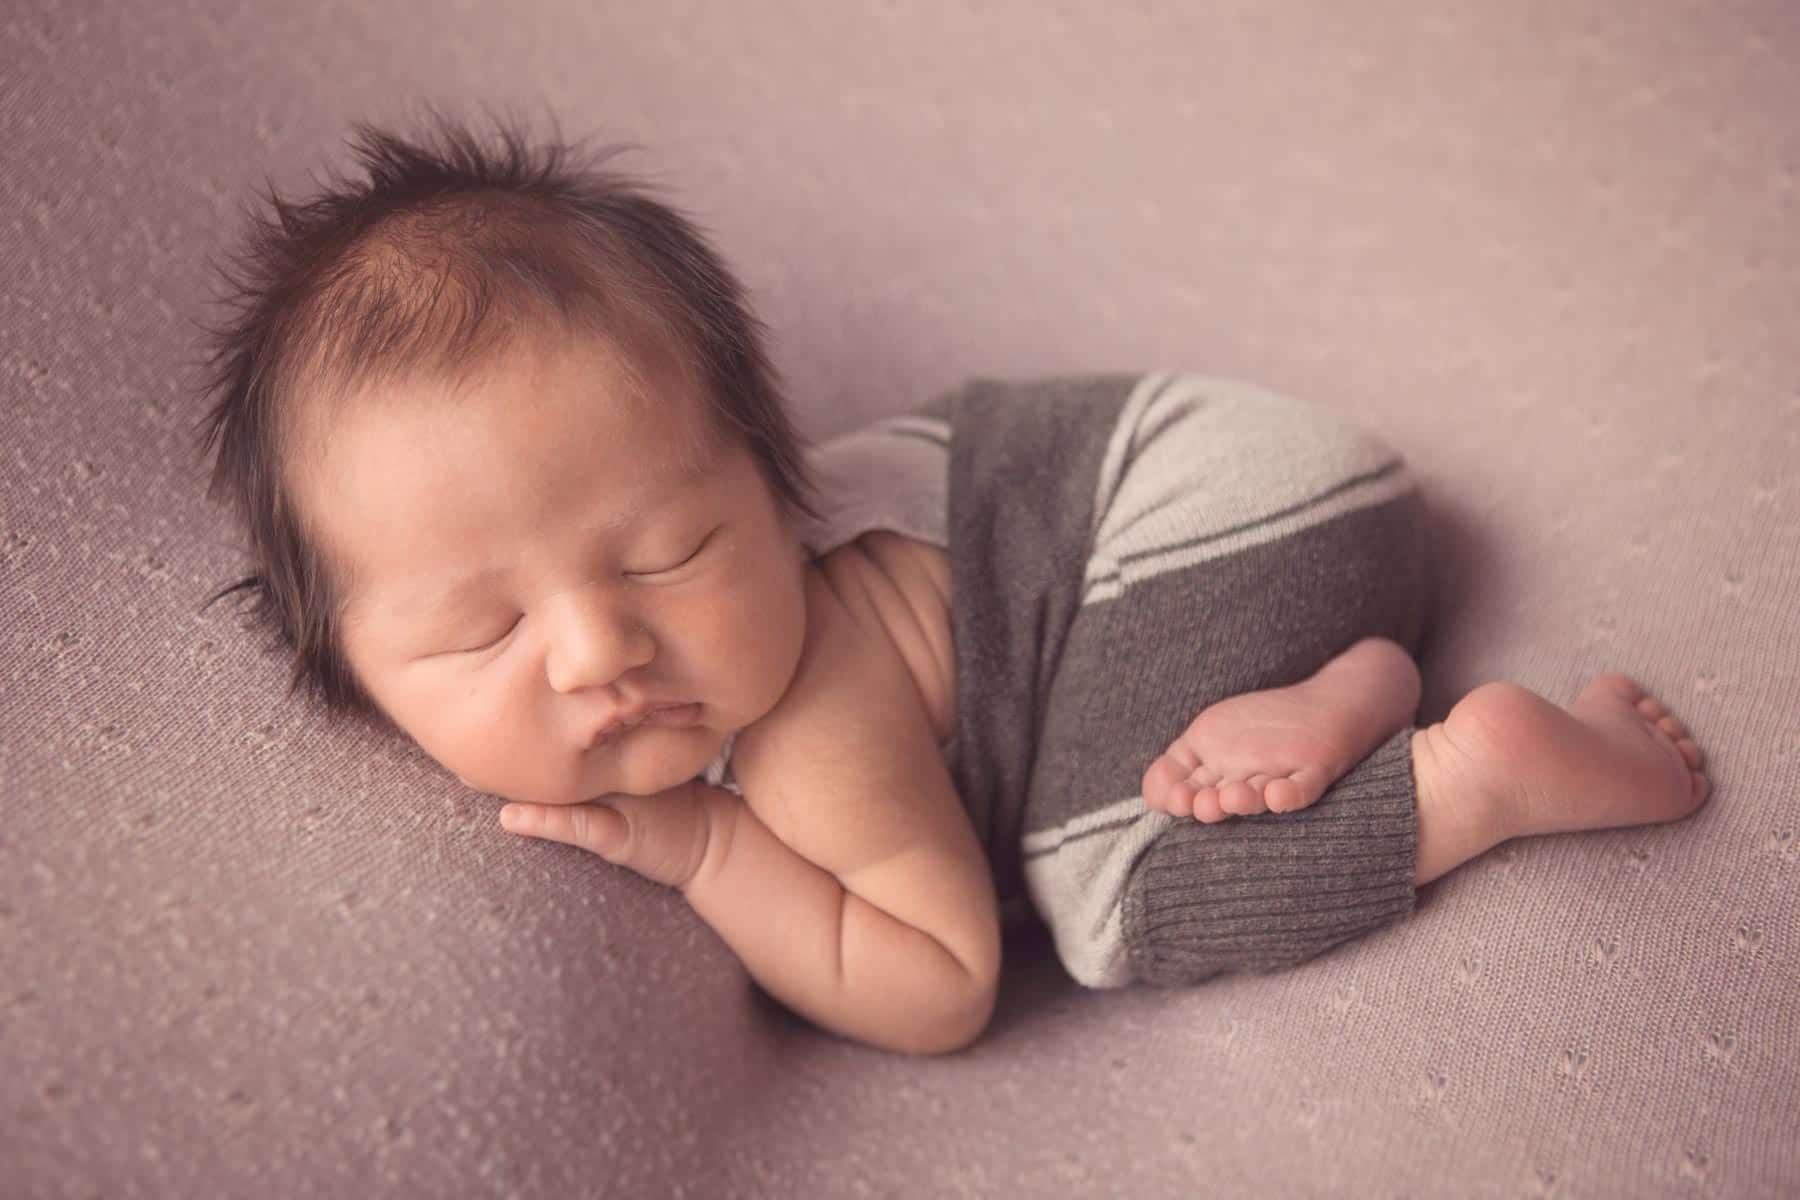 Newborn-Photography-Glasgow-South-Lanarkshire-Dawn Martin004